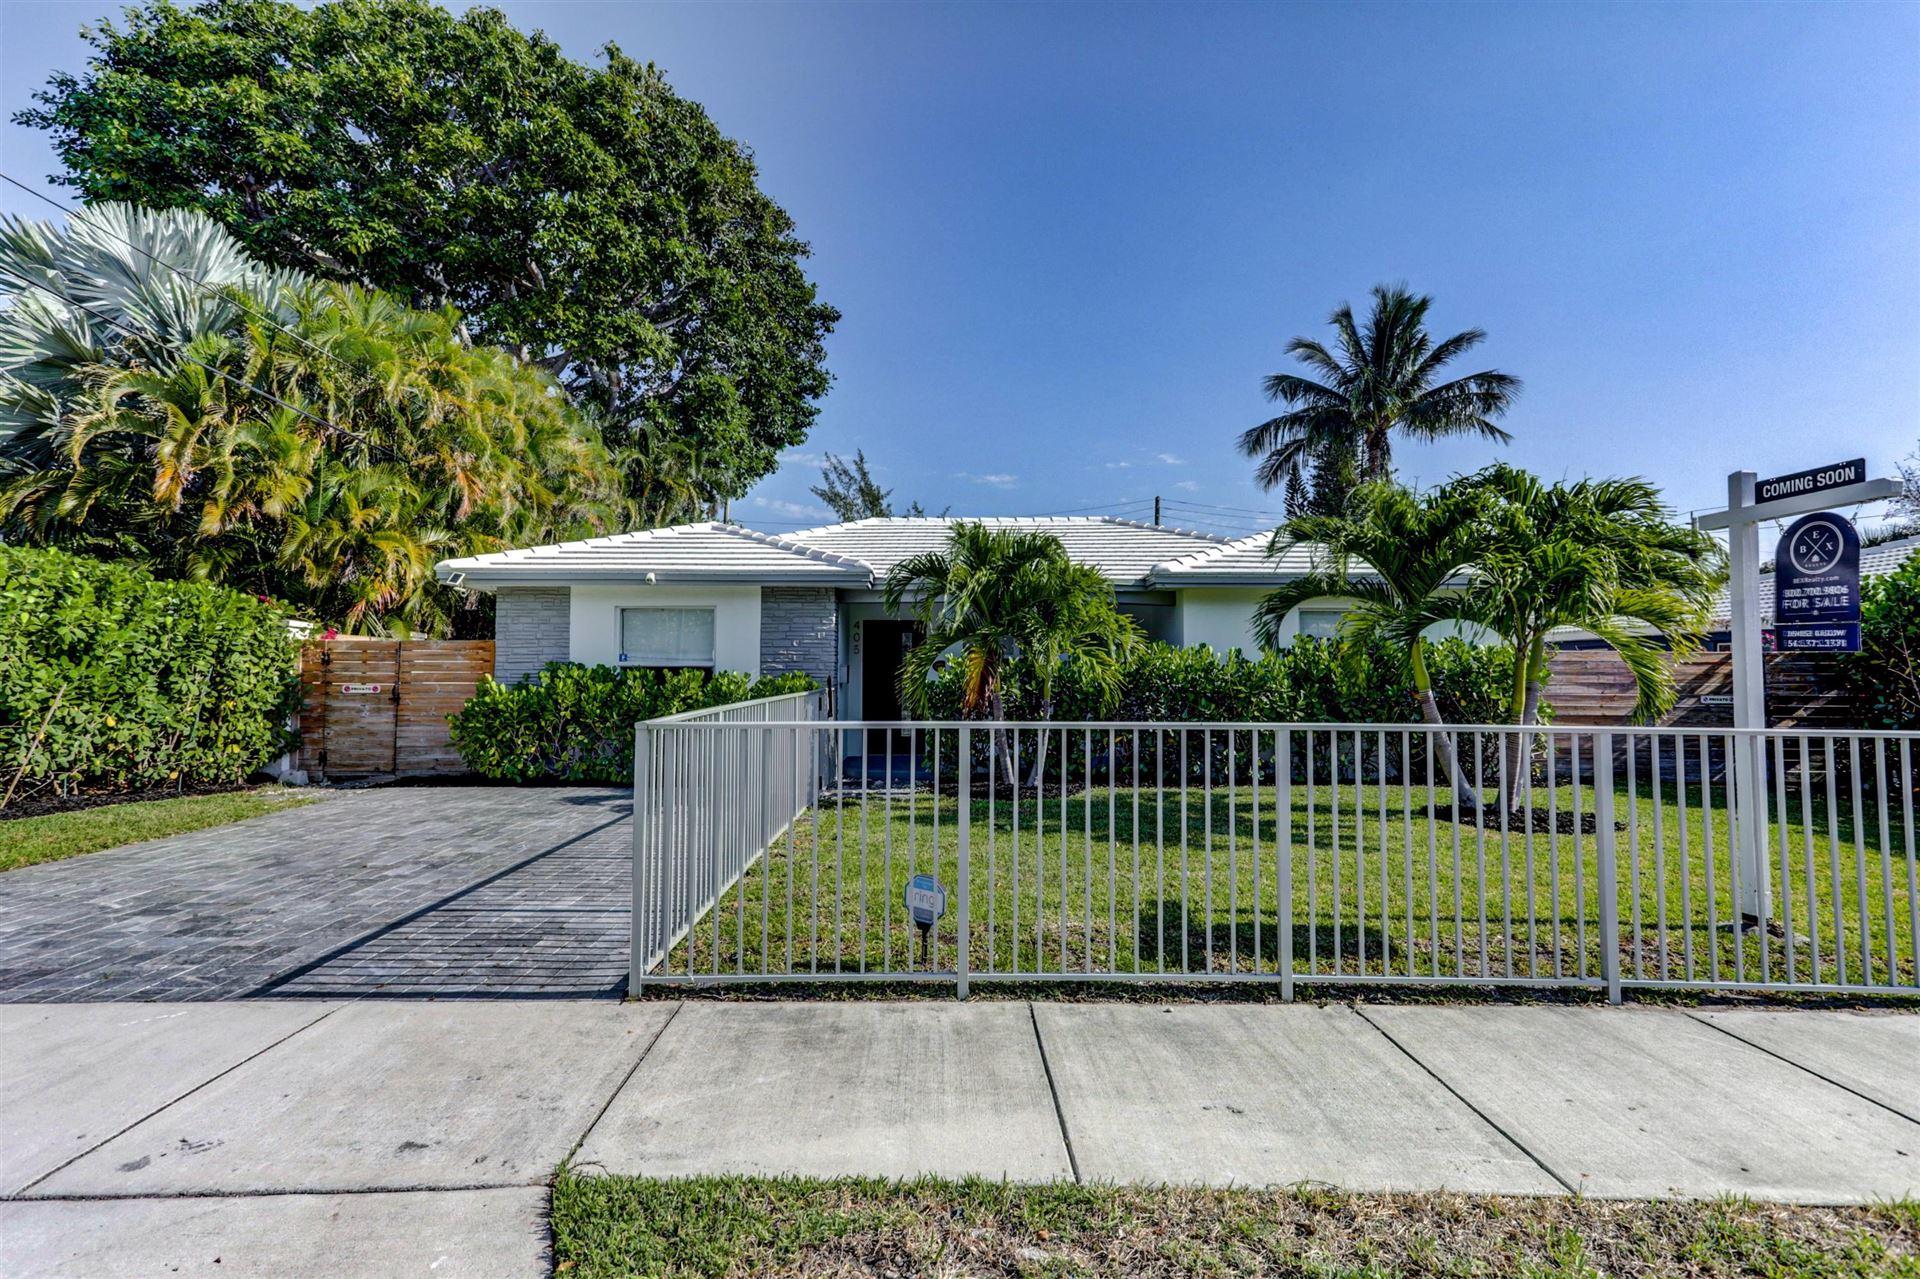 Photo of 405 28th Street, West Palm Beach, FL 33407 (MLS # RX-10708611)